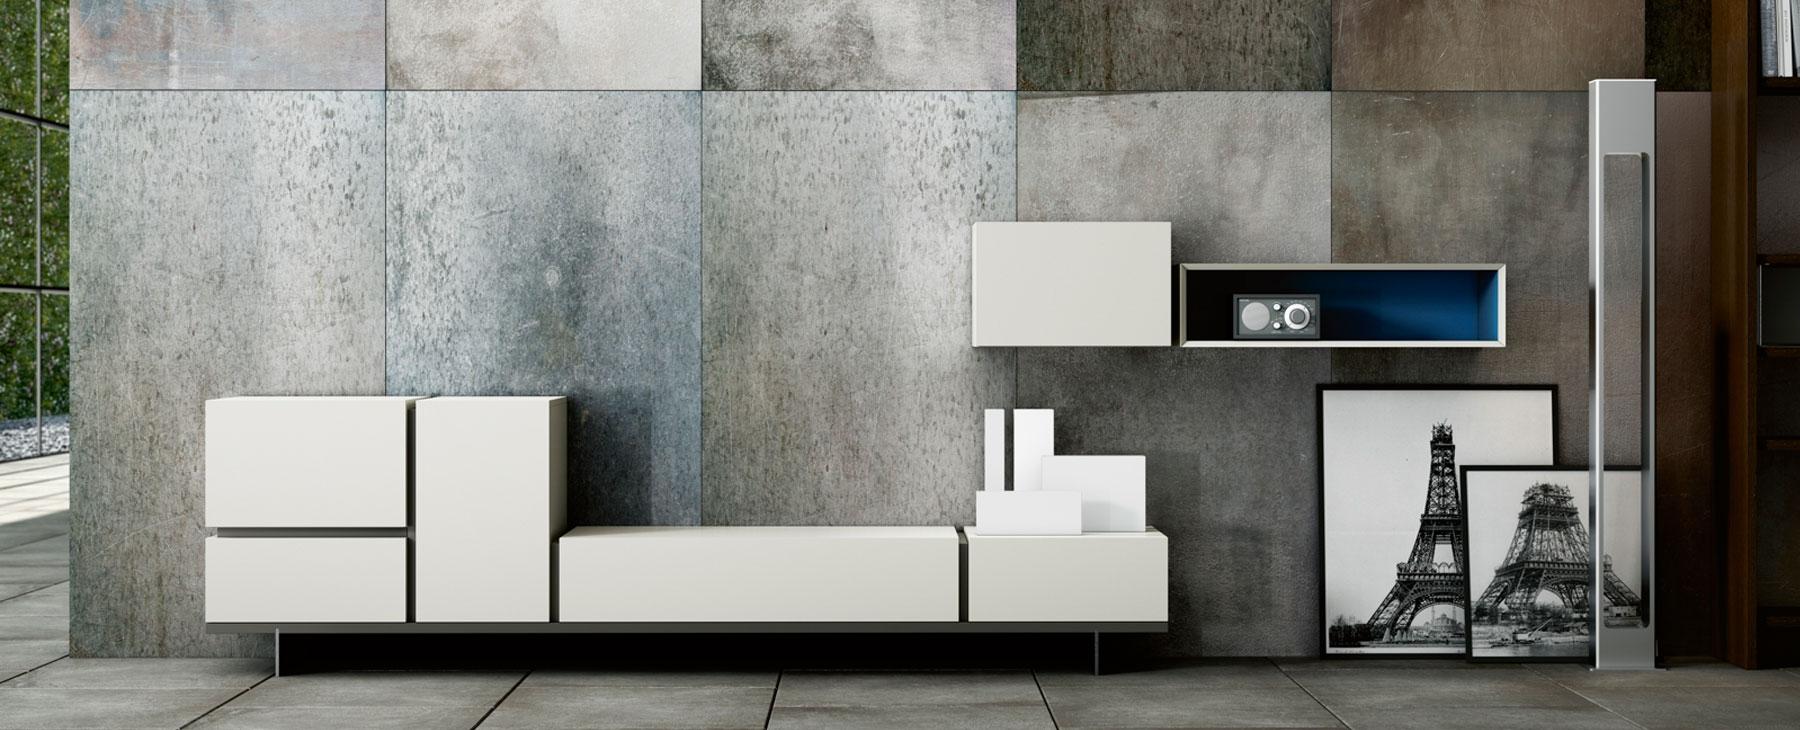 Muebles televisi n emede mobiliario de dise o for Muebles television diseno